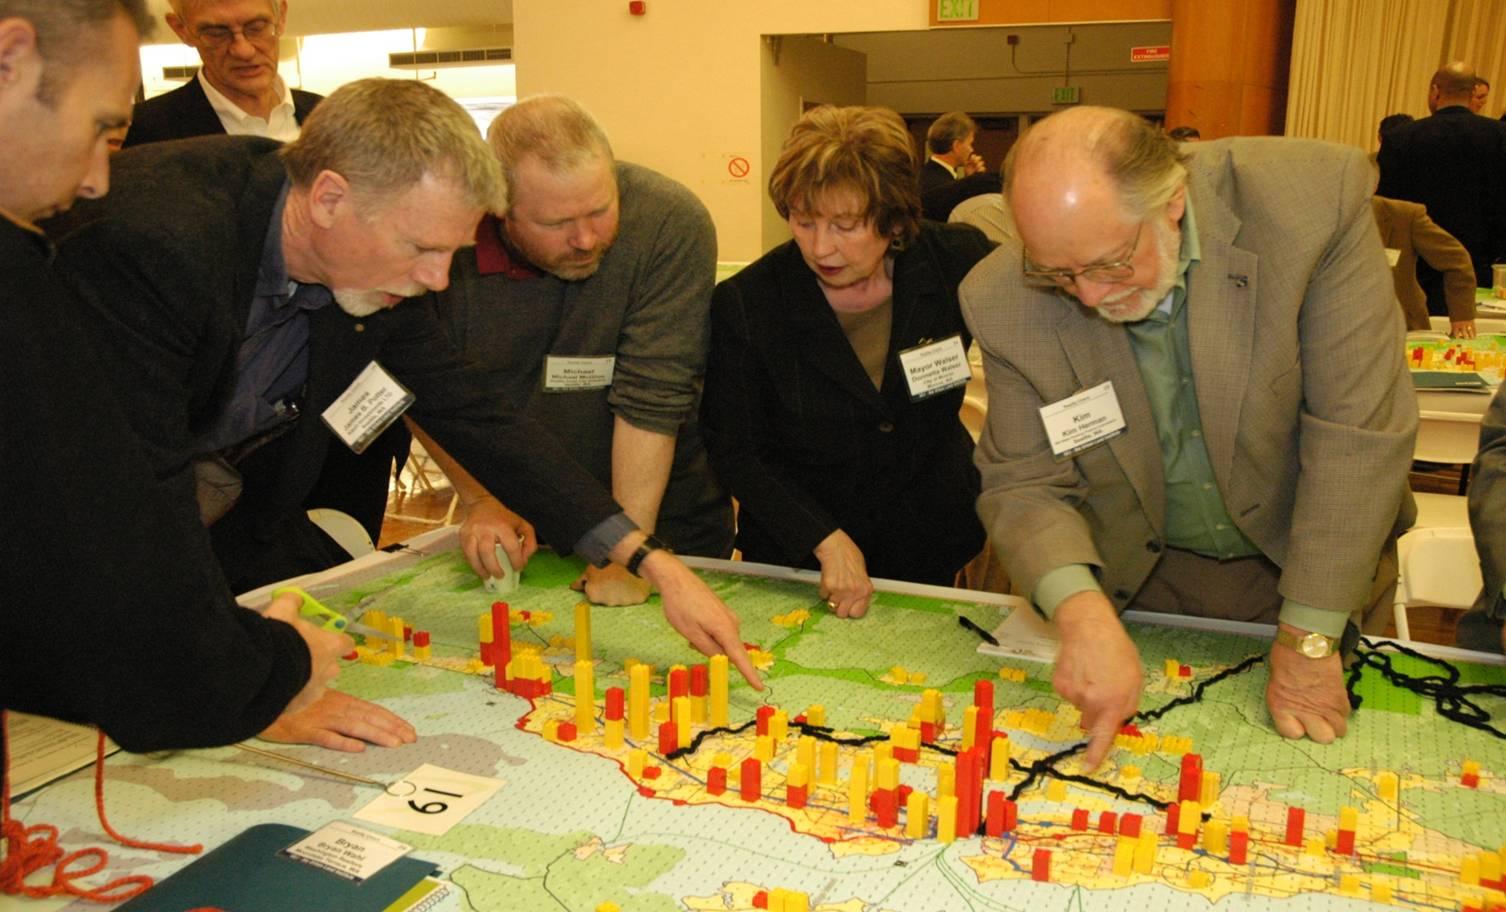 Business plan community futures vernon